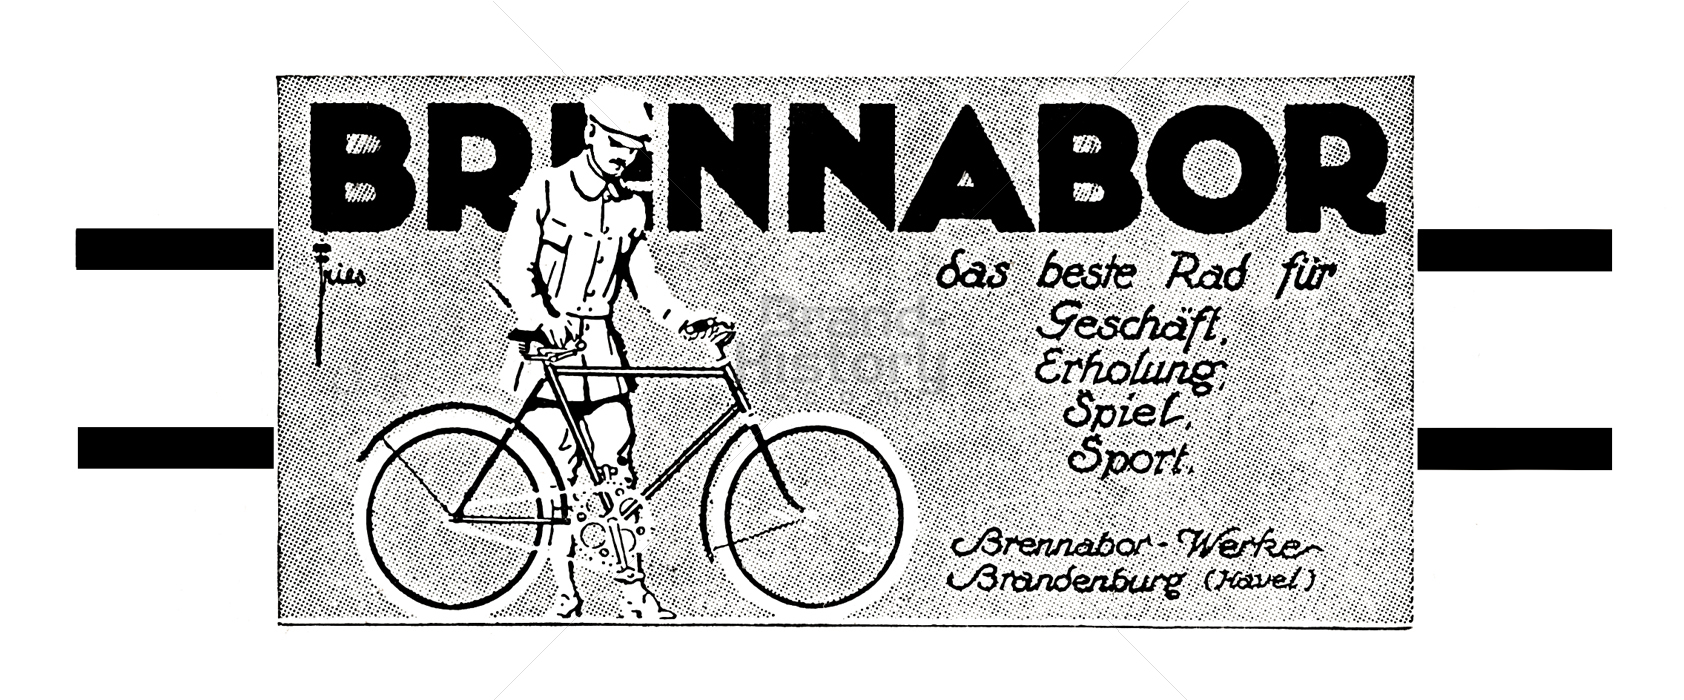 Fahrrad | Brand History